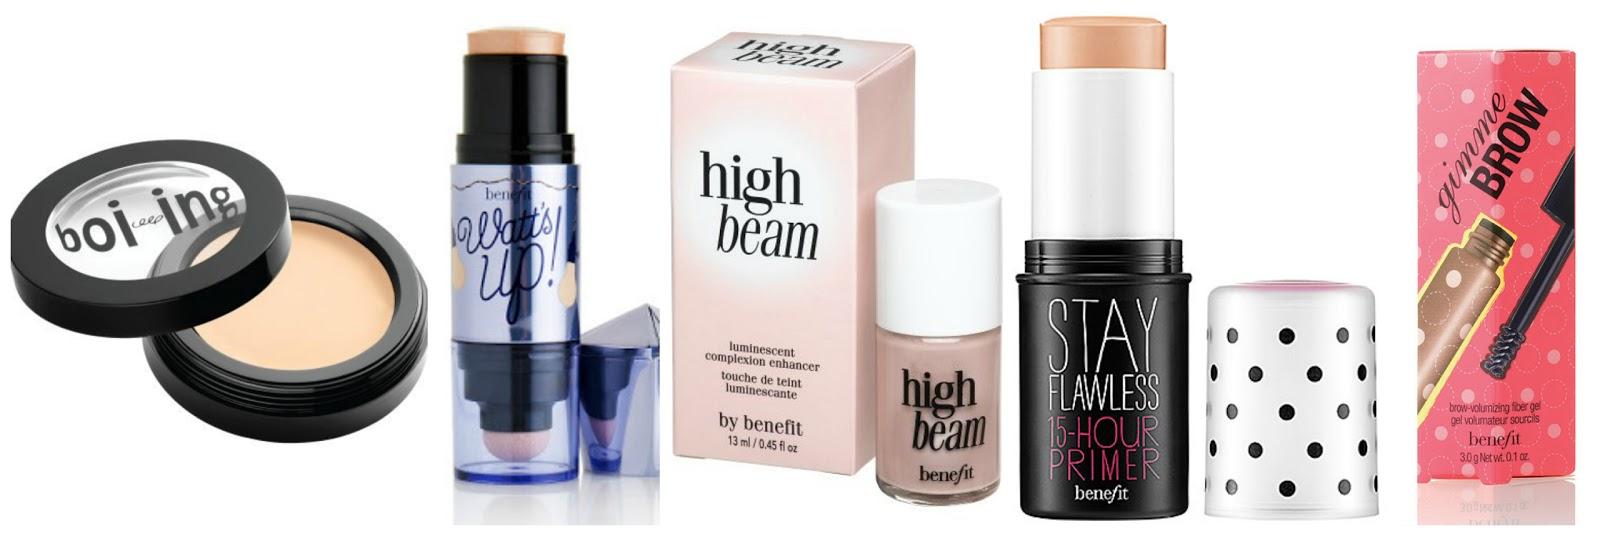 Benefit Cosmetics uk blog